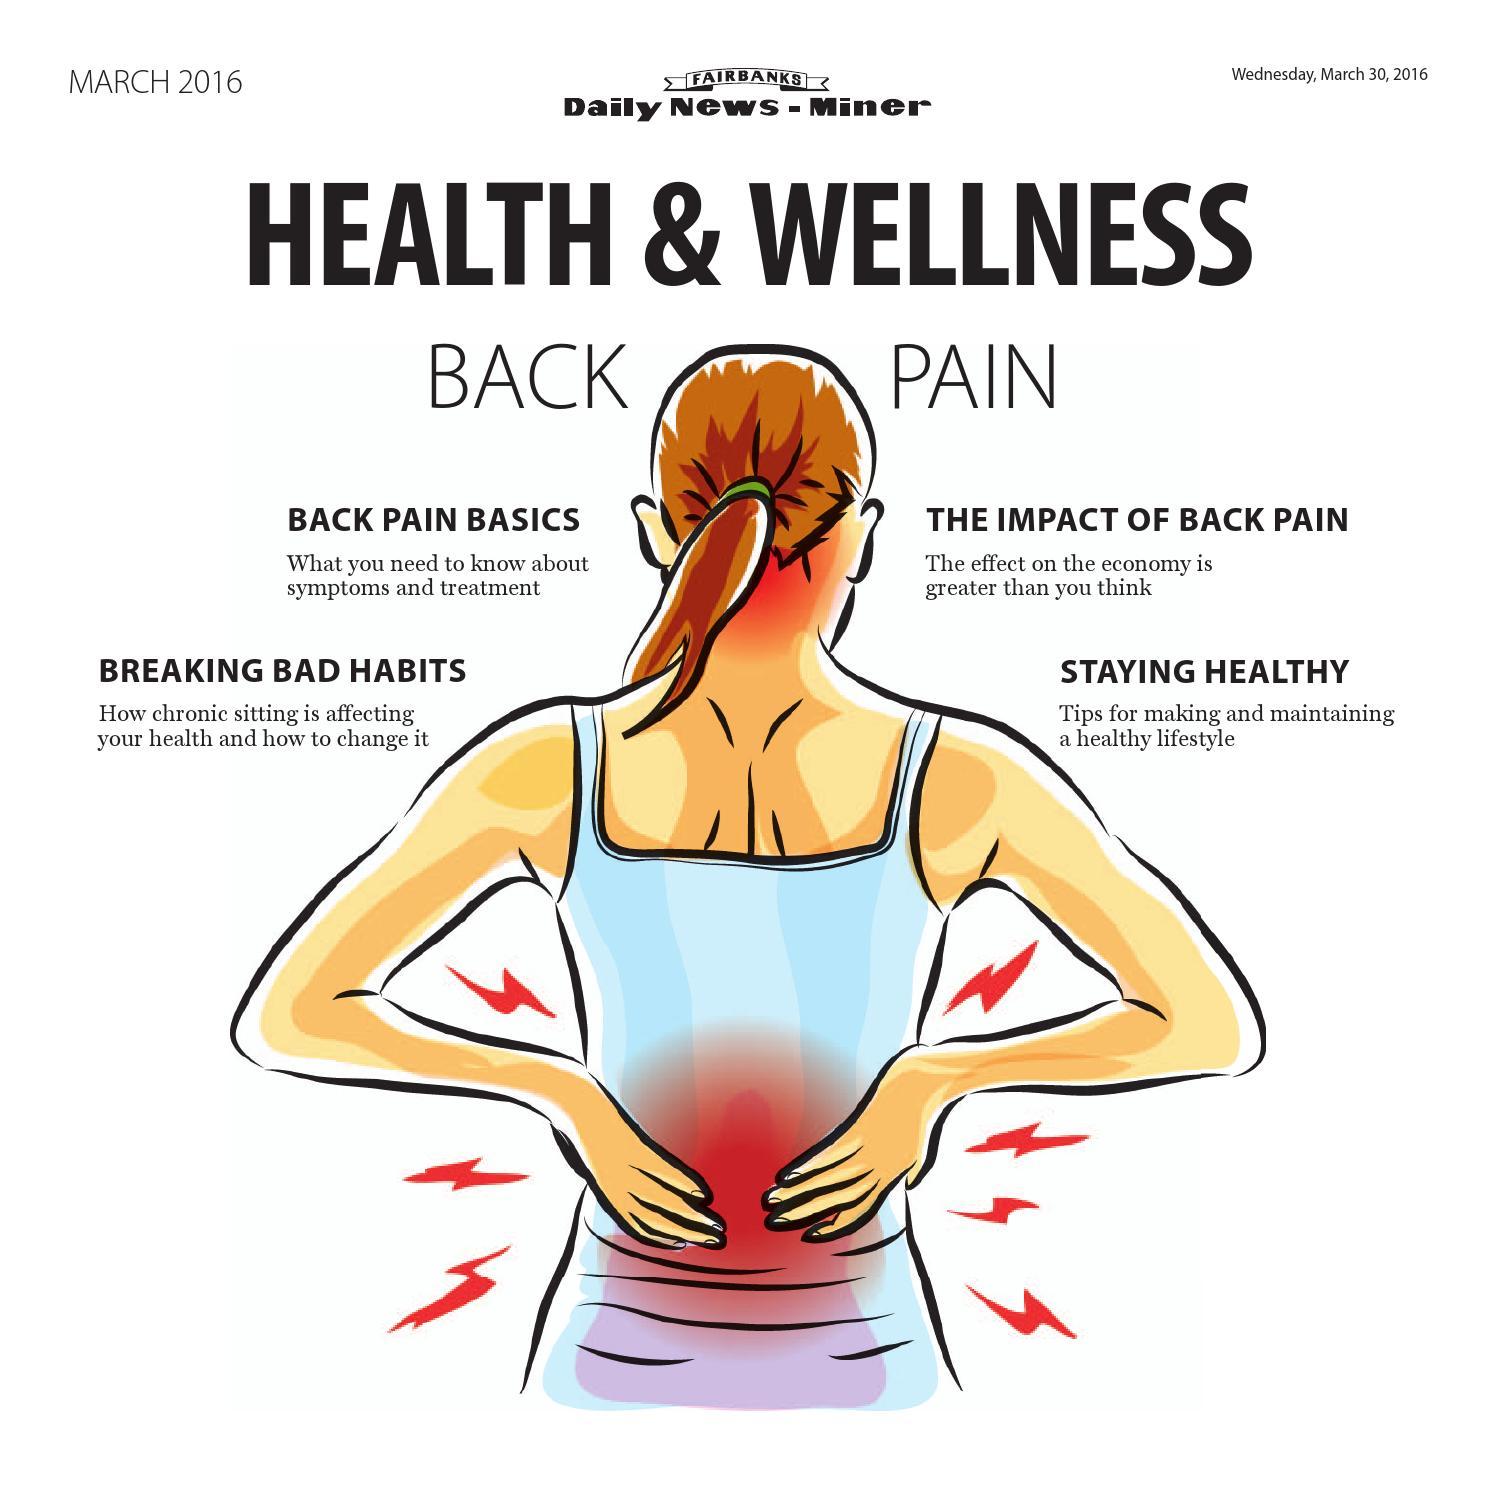 9ae1ab9fc0 Health   Wellness - Back Pain by Fairbanks Daily News-Miner - issuu